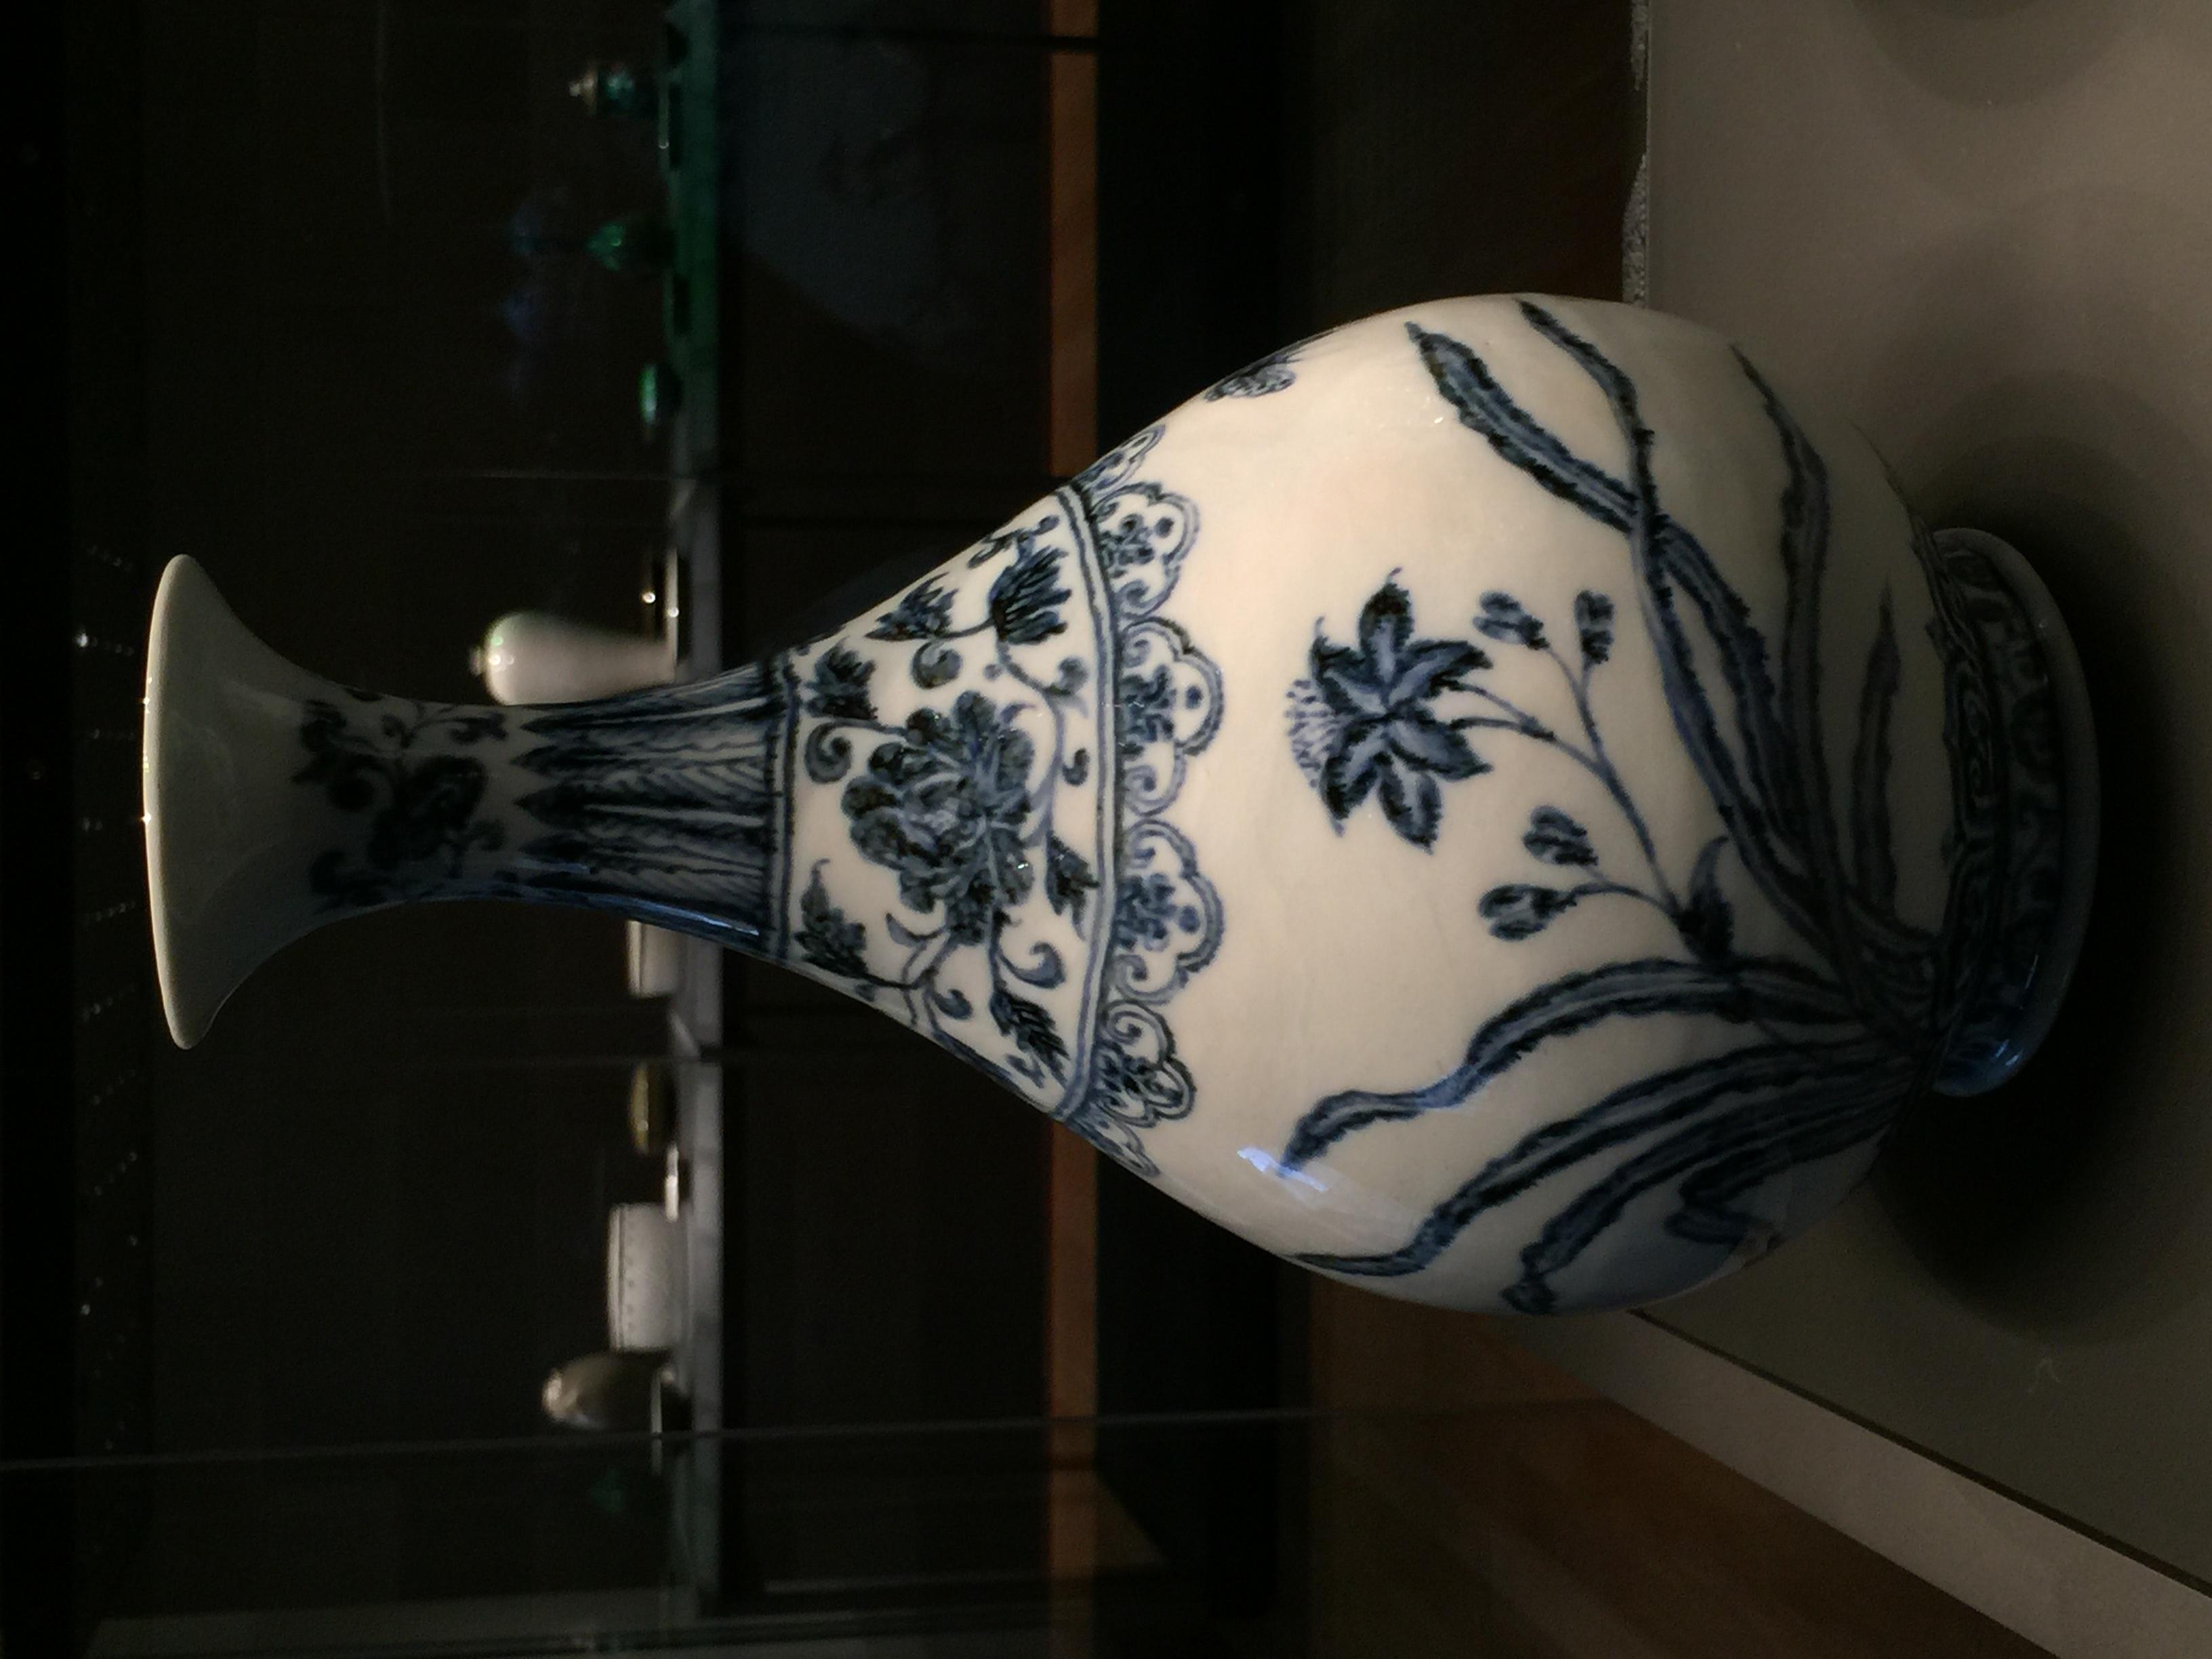 Chinese-Porcelain-British-Museum-Percival-David-jessewaugh.com-38.jpg